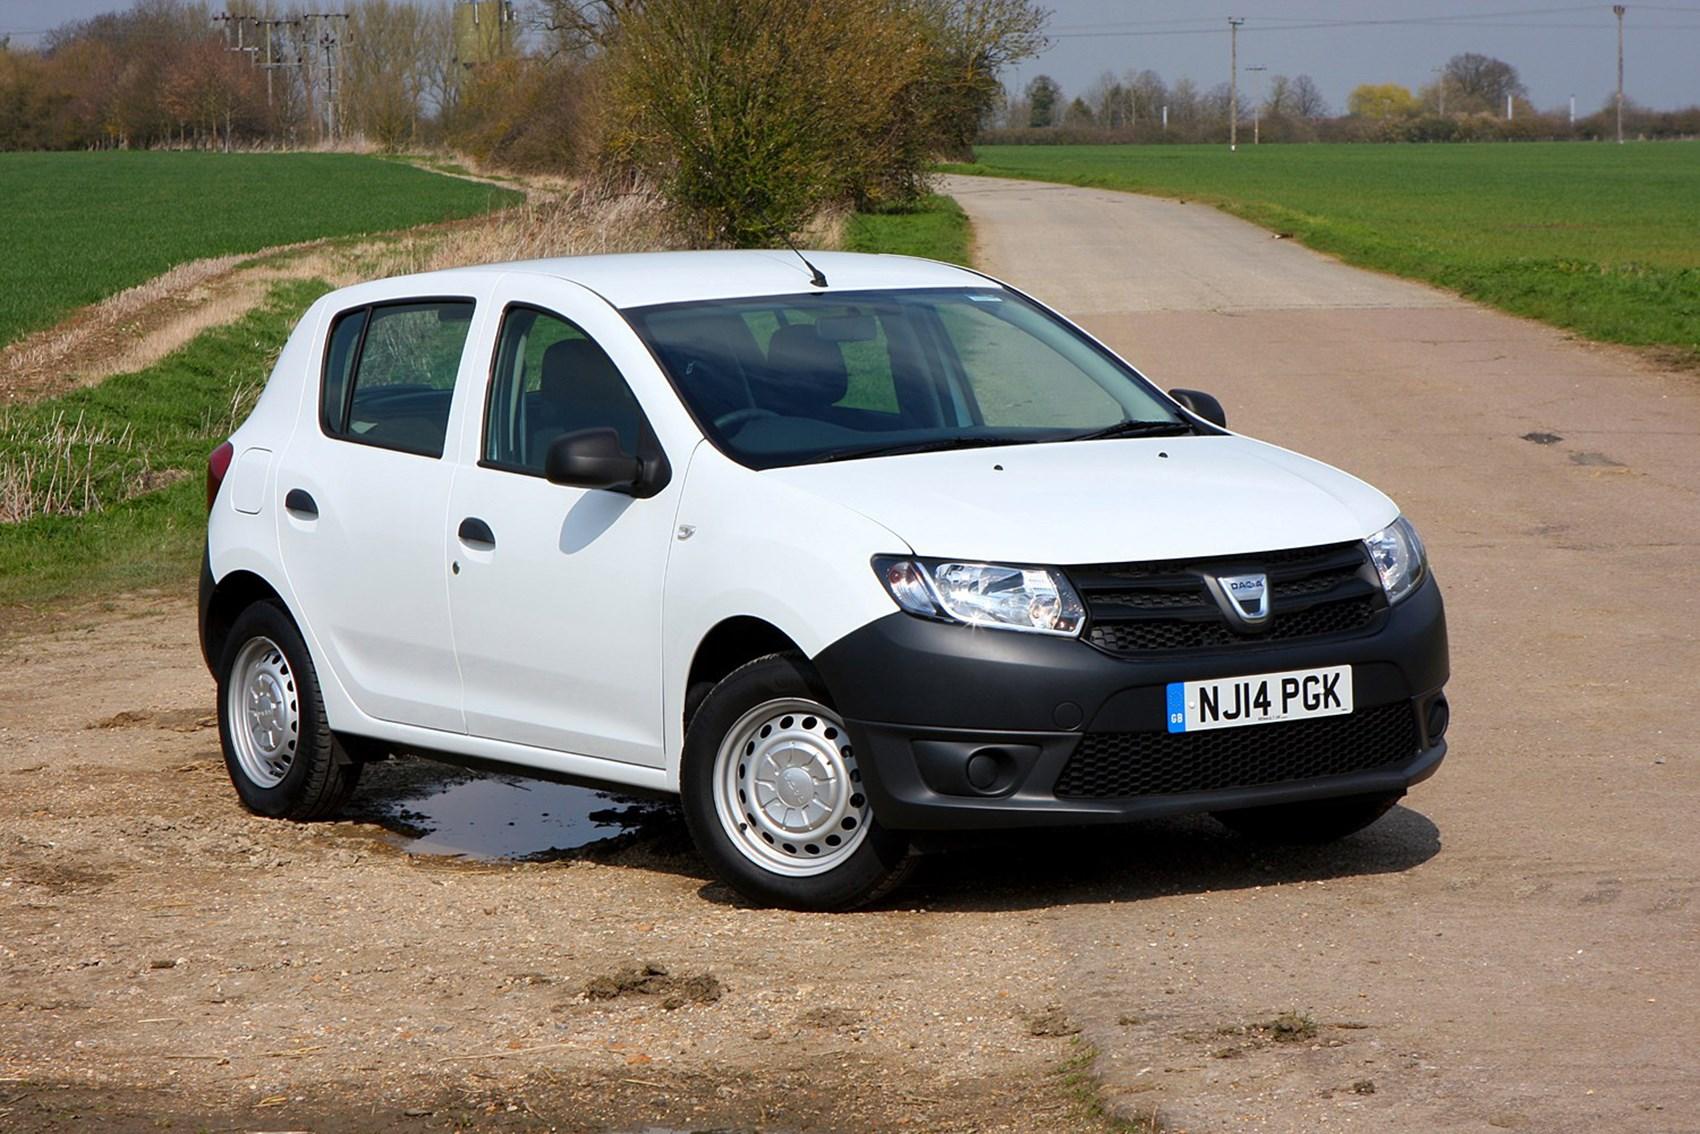 Dacia Sandero - small cars with big boots